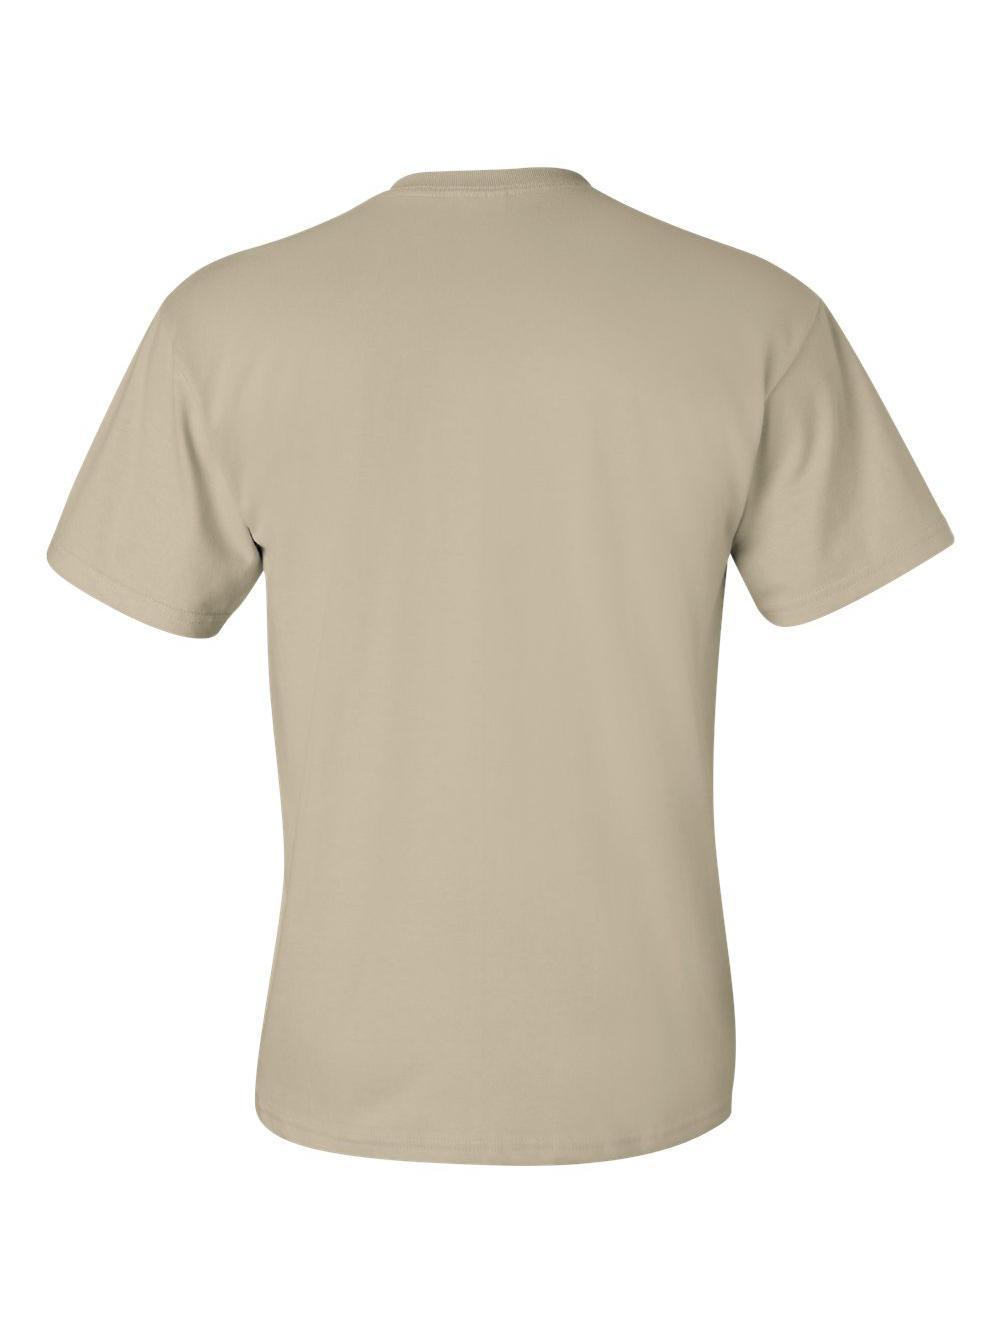 Gildan-Ultra-Cotton-T-Shirt-with-a-Pocket-2300 thumbnail 40